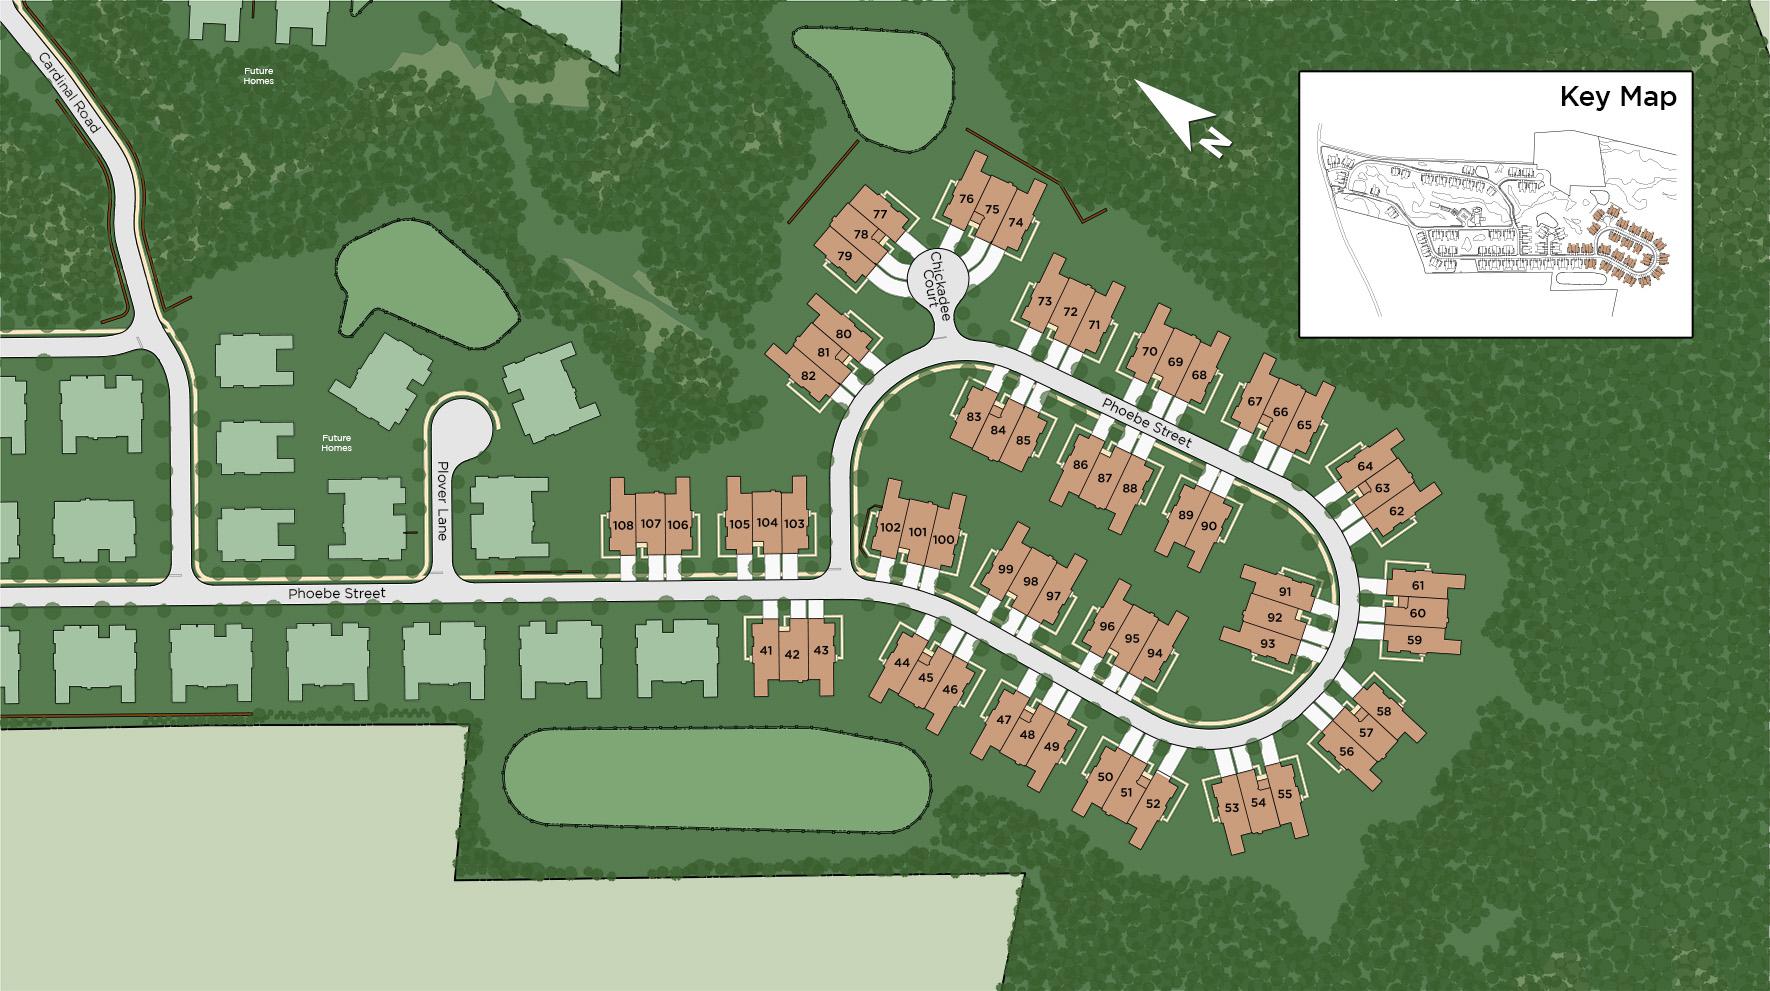 Preserve at Emerald Pines - Phoebe Street Site Plan